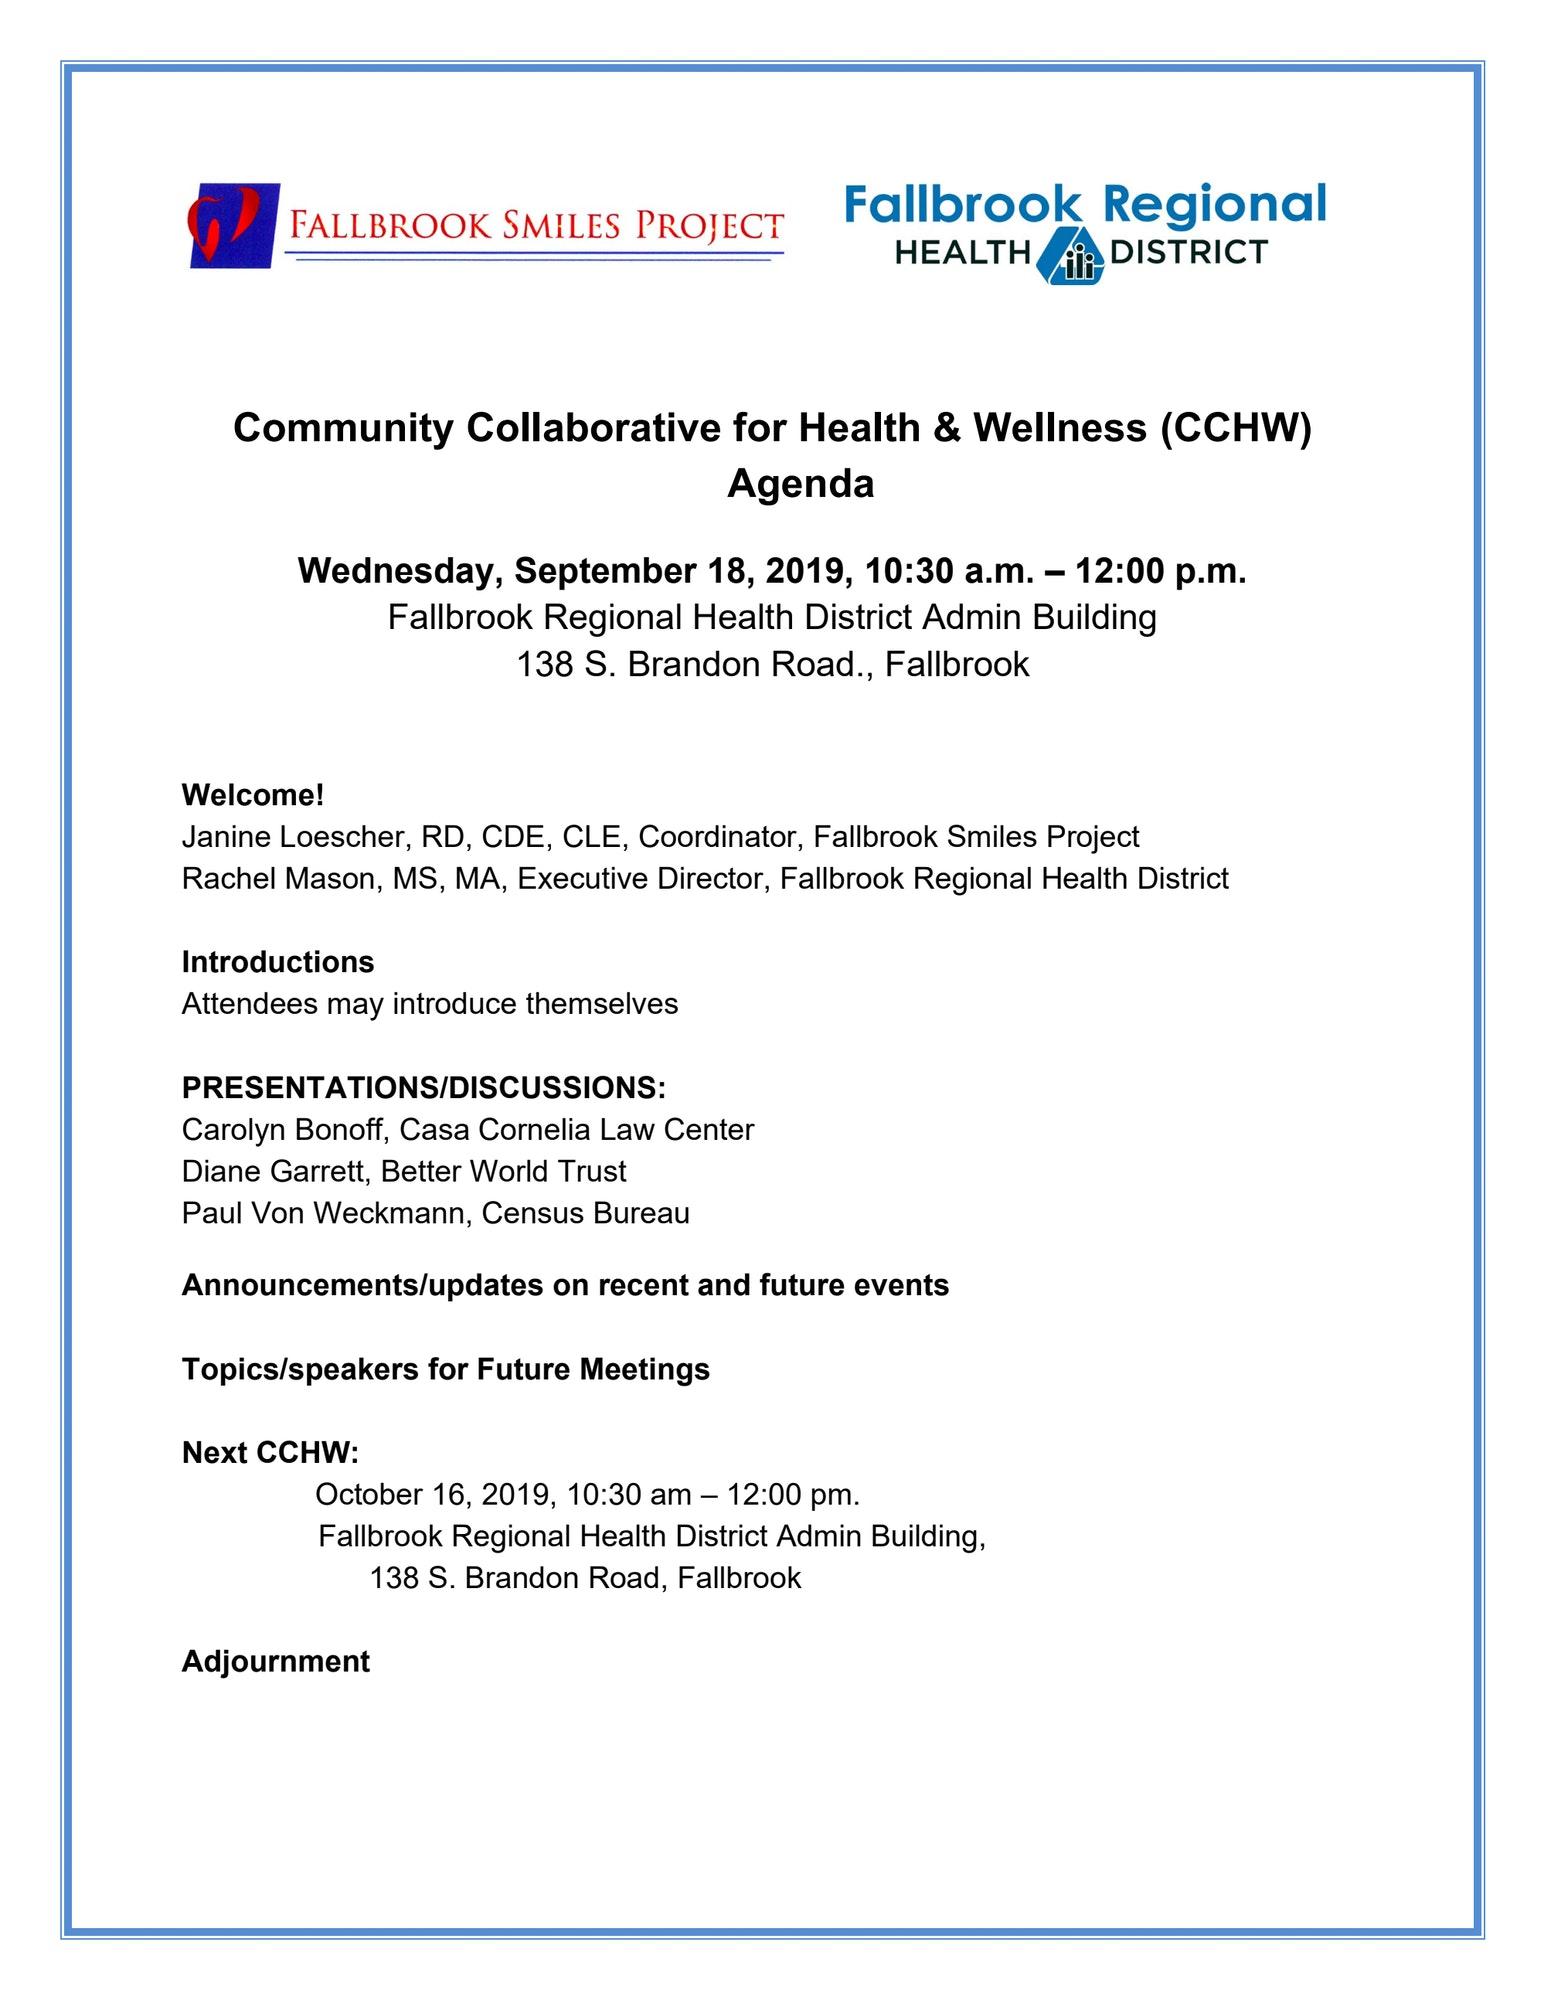 Community Collaborative for Health & Wellness Agenda for September 18, 10:30am-12pm